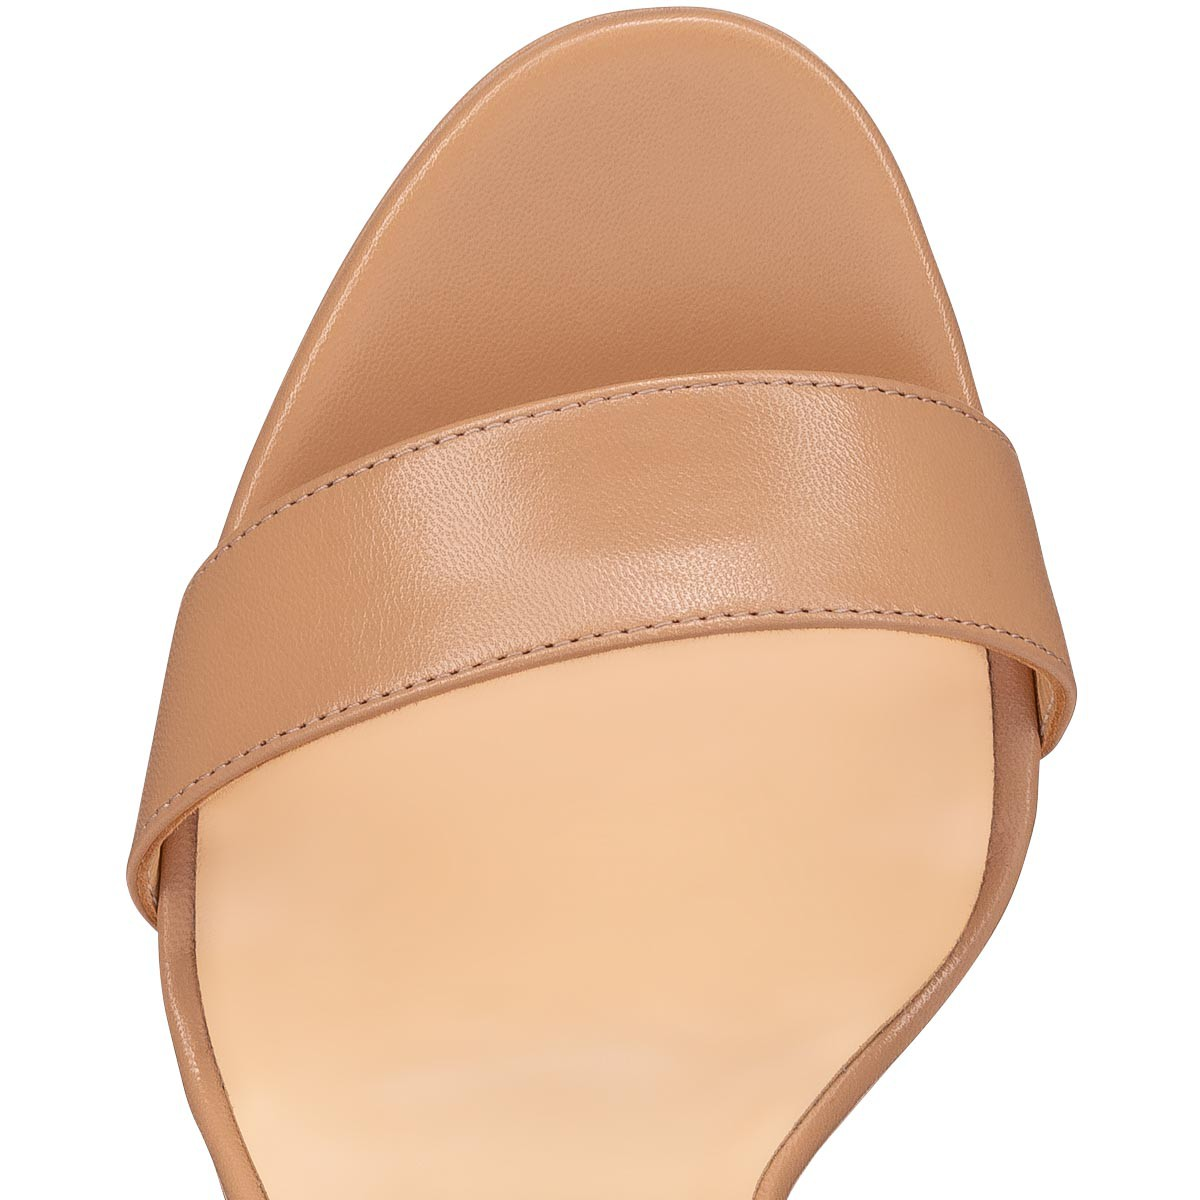 鞋履 - Choca Lux 120 Kid - Christian Louboutin